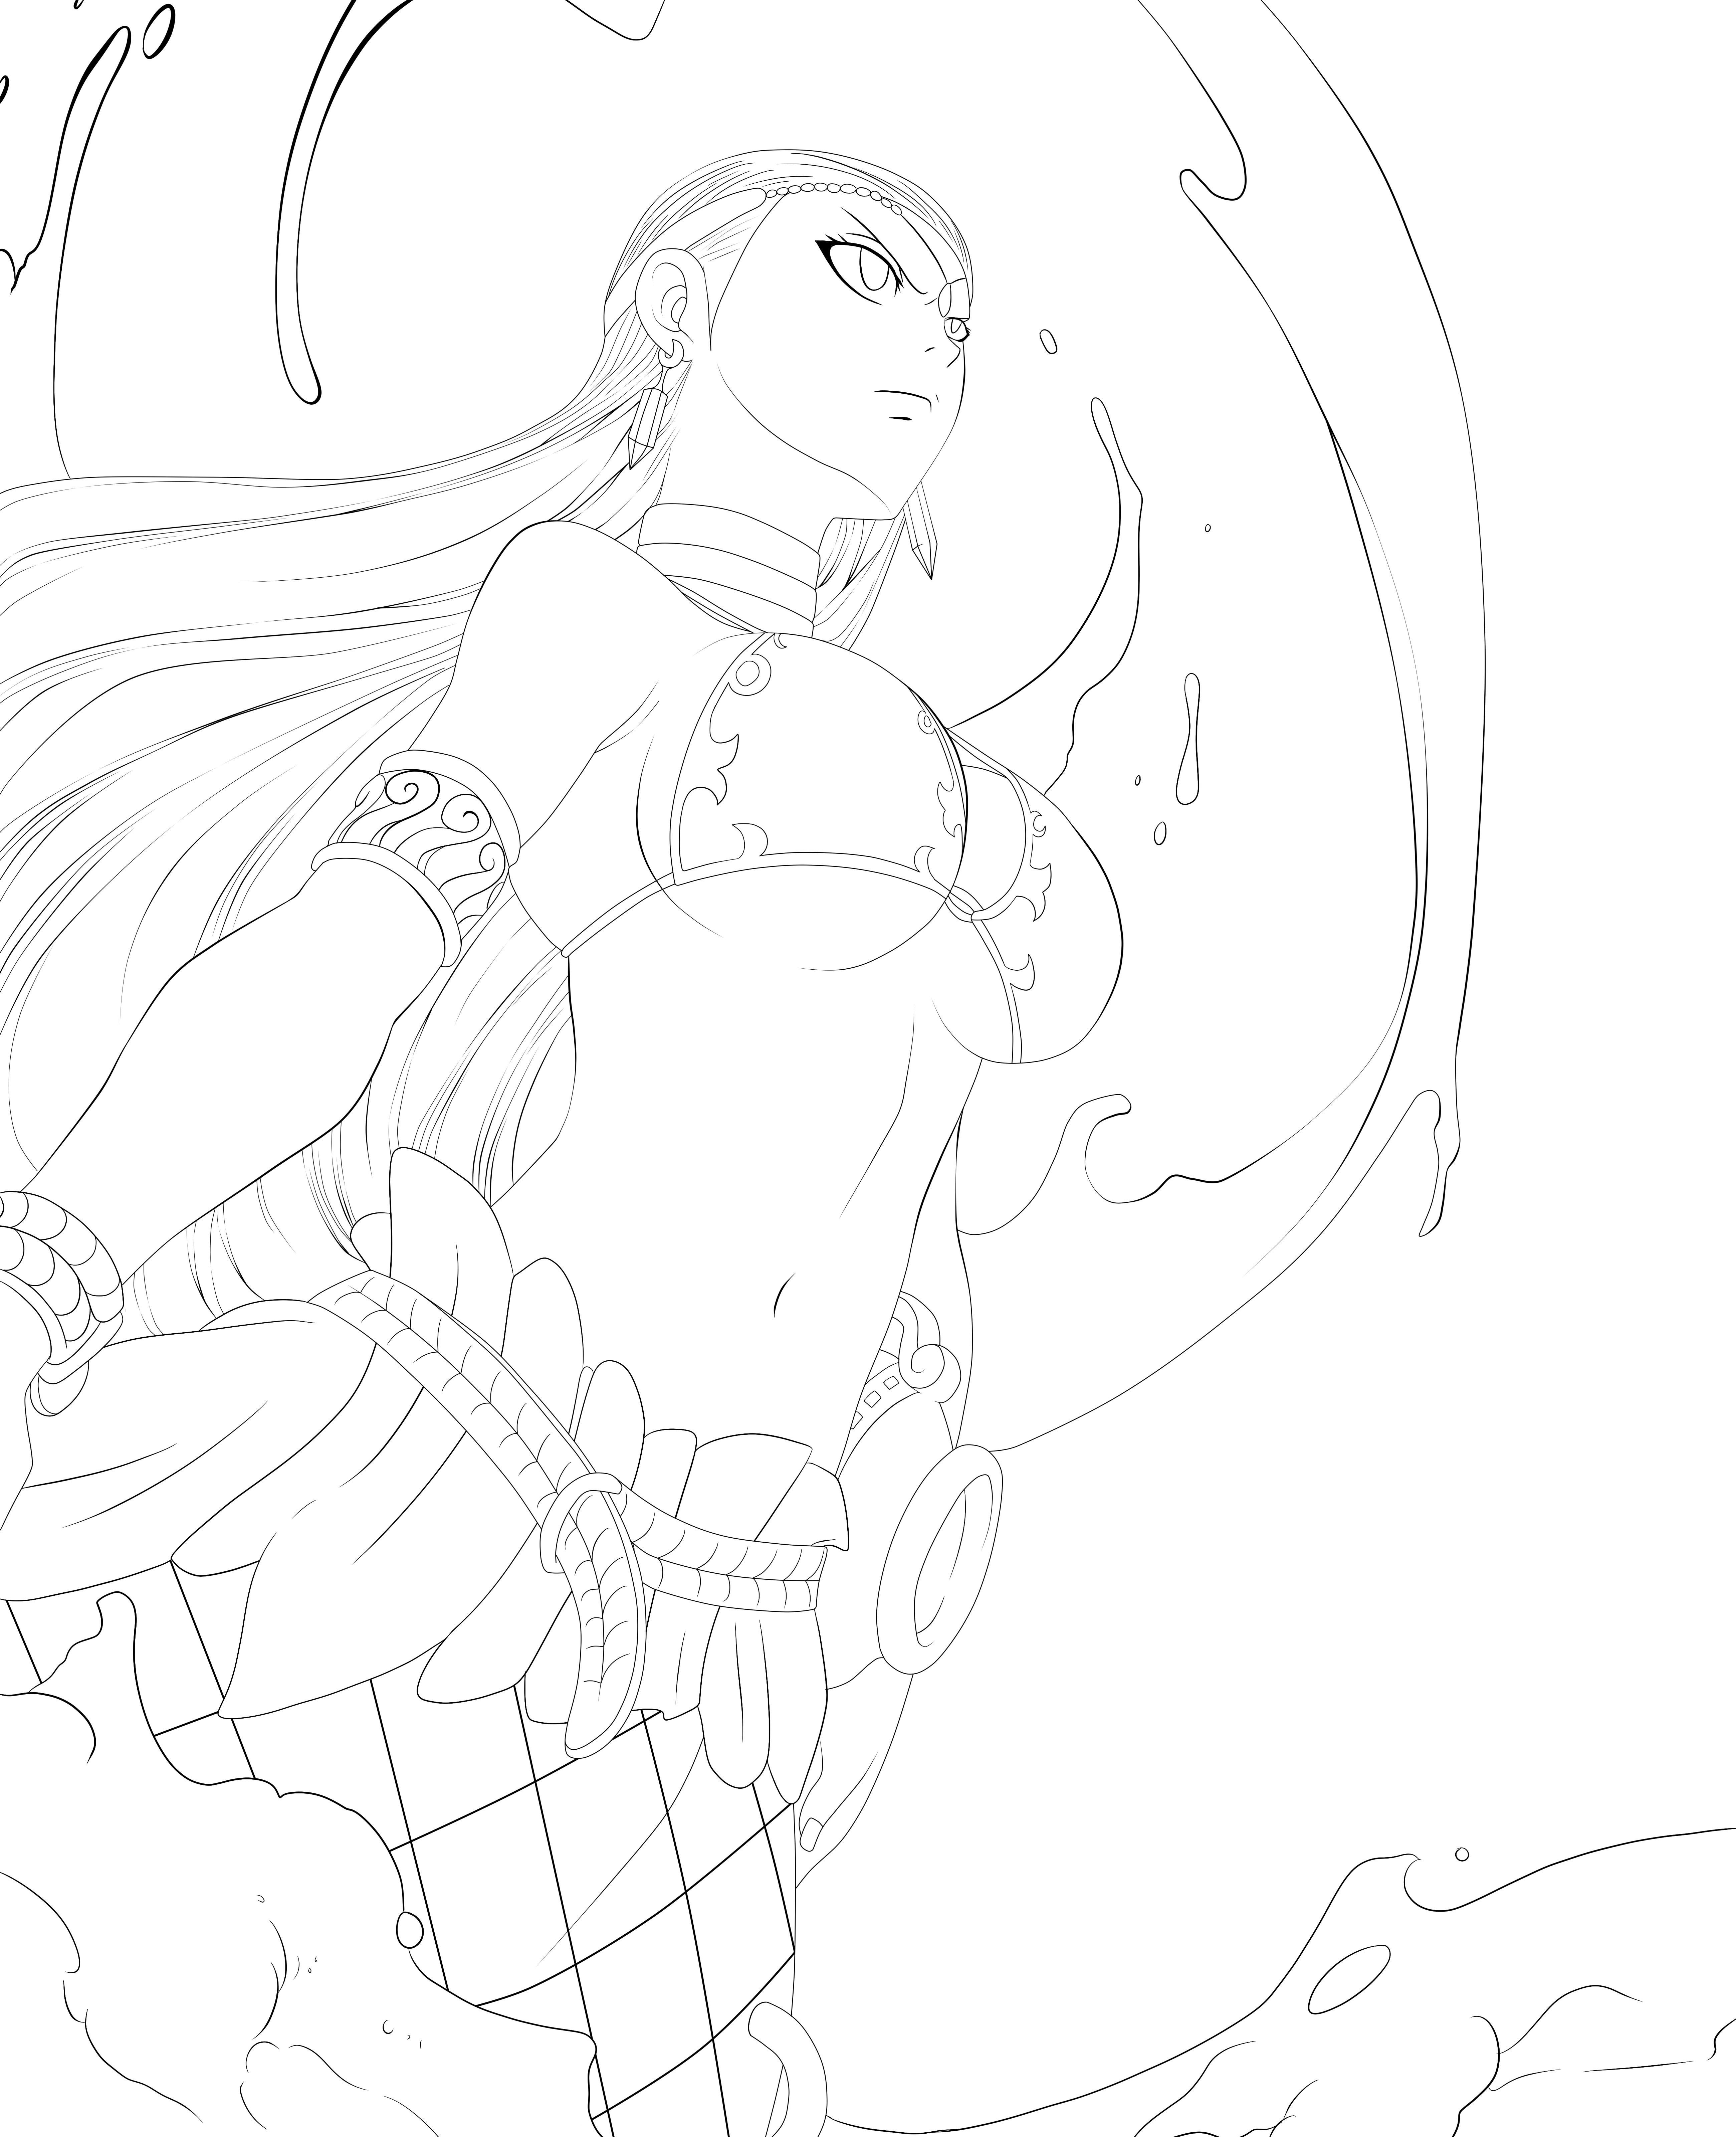 Ft Aquarius Chapter 310 Lines By Minouze Anime Lineart Fairy Tail Art Anime Art Girl [ 6400 x 5200 Pixel ]